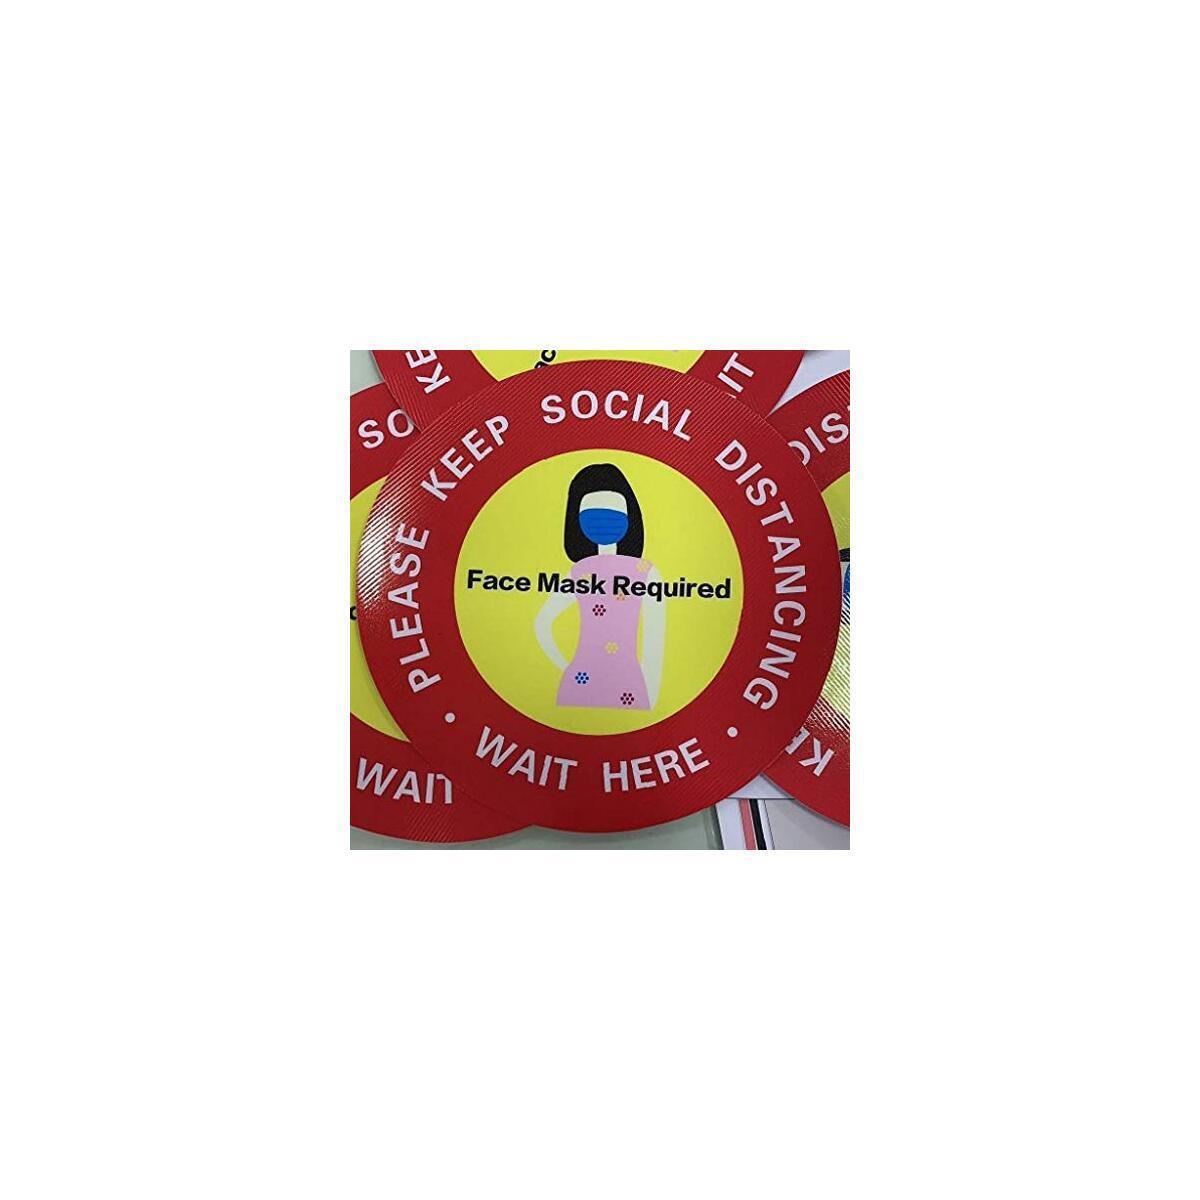 ROSEWARD Waterproof Twill Weave Anti-Slip Social Distancing Floor Decals Sticker Signs (12